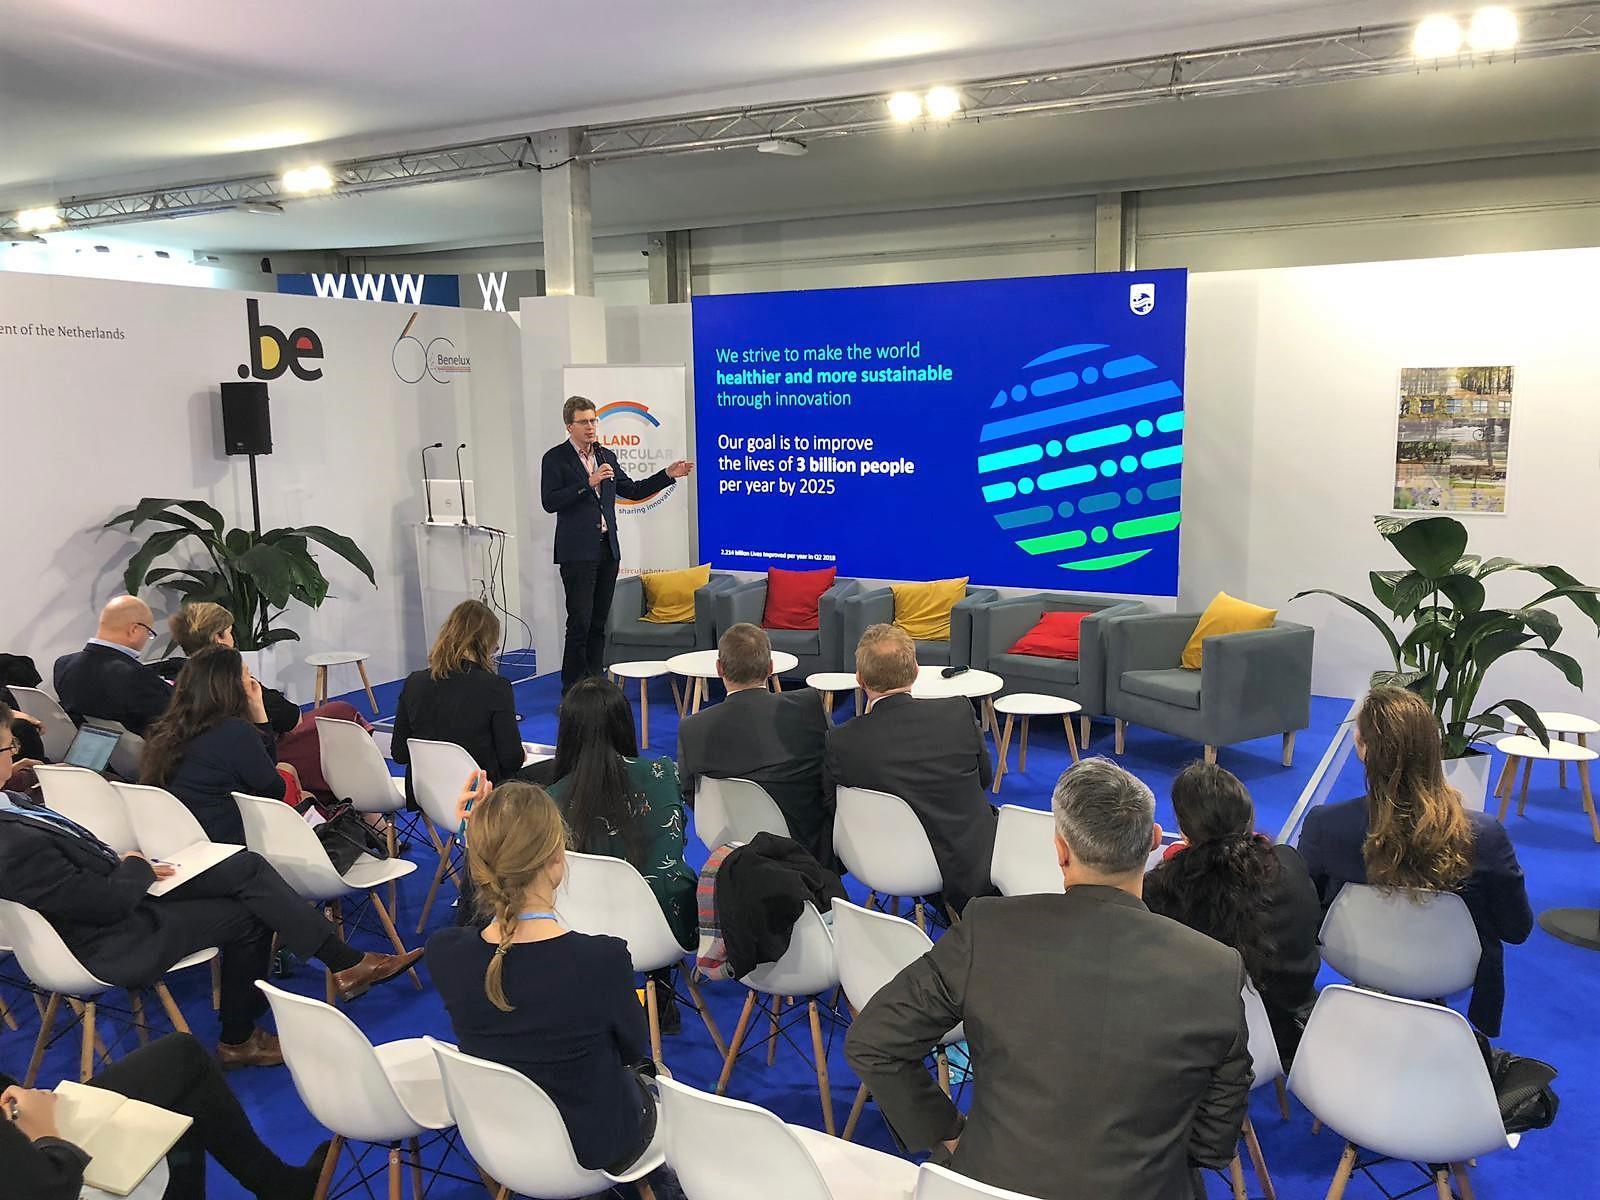 Harald-Tepper-Program-Lead-Circular-Economy-at-Philips